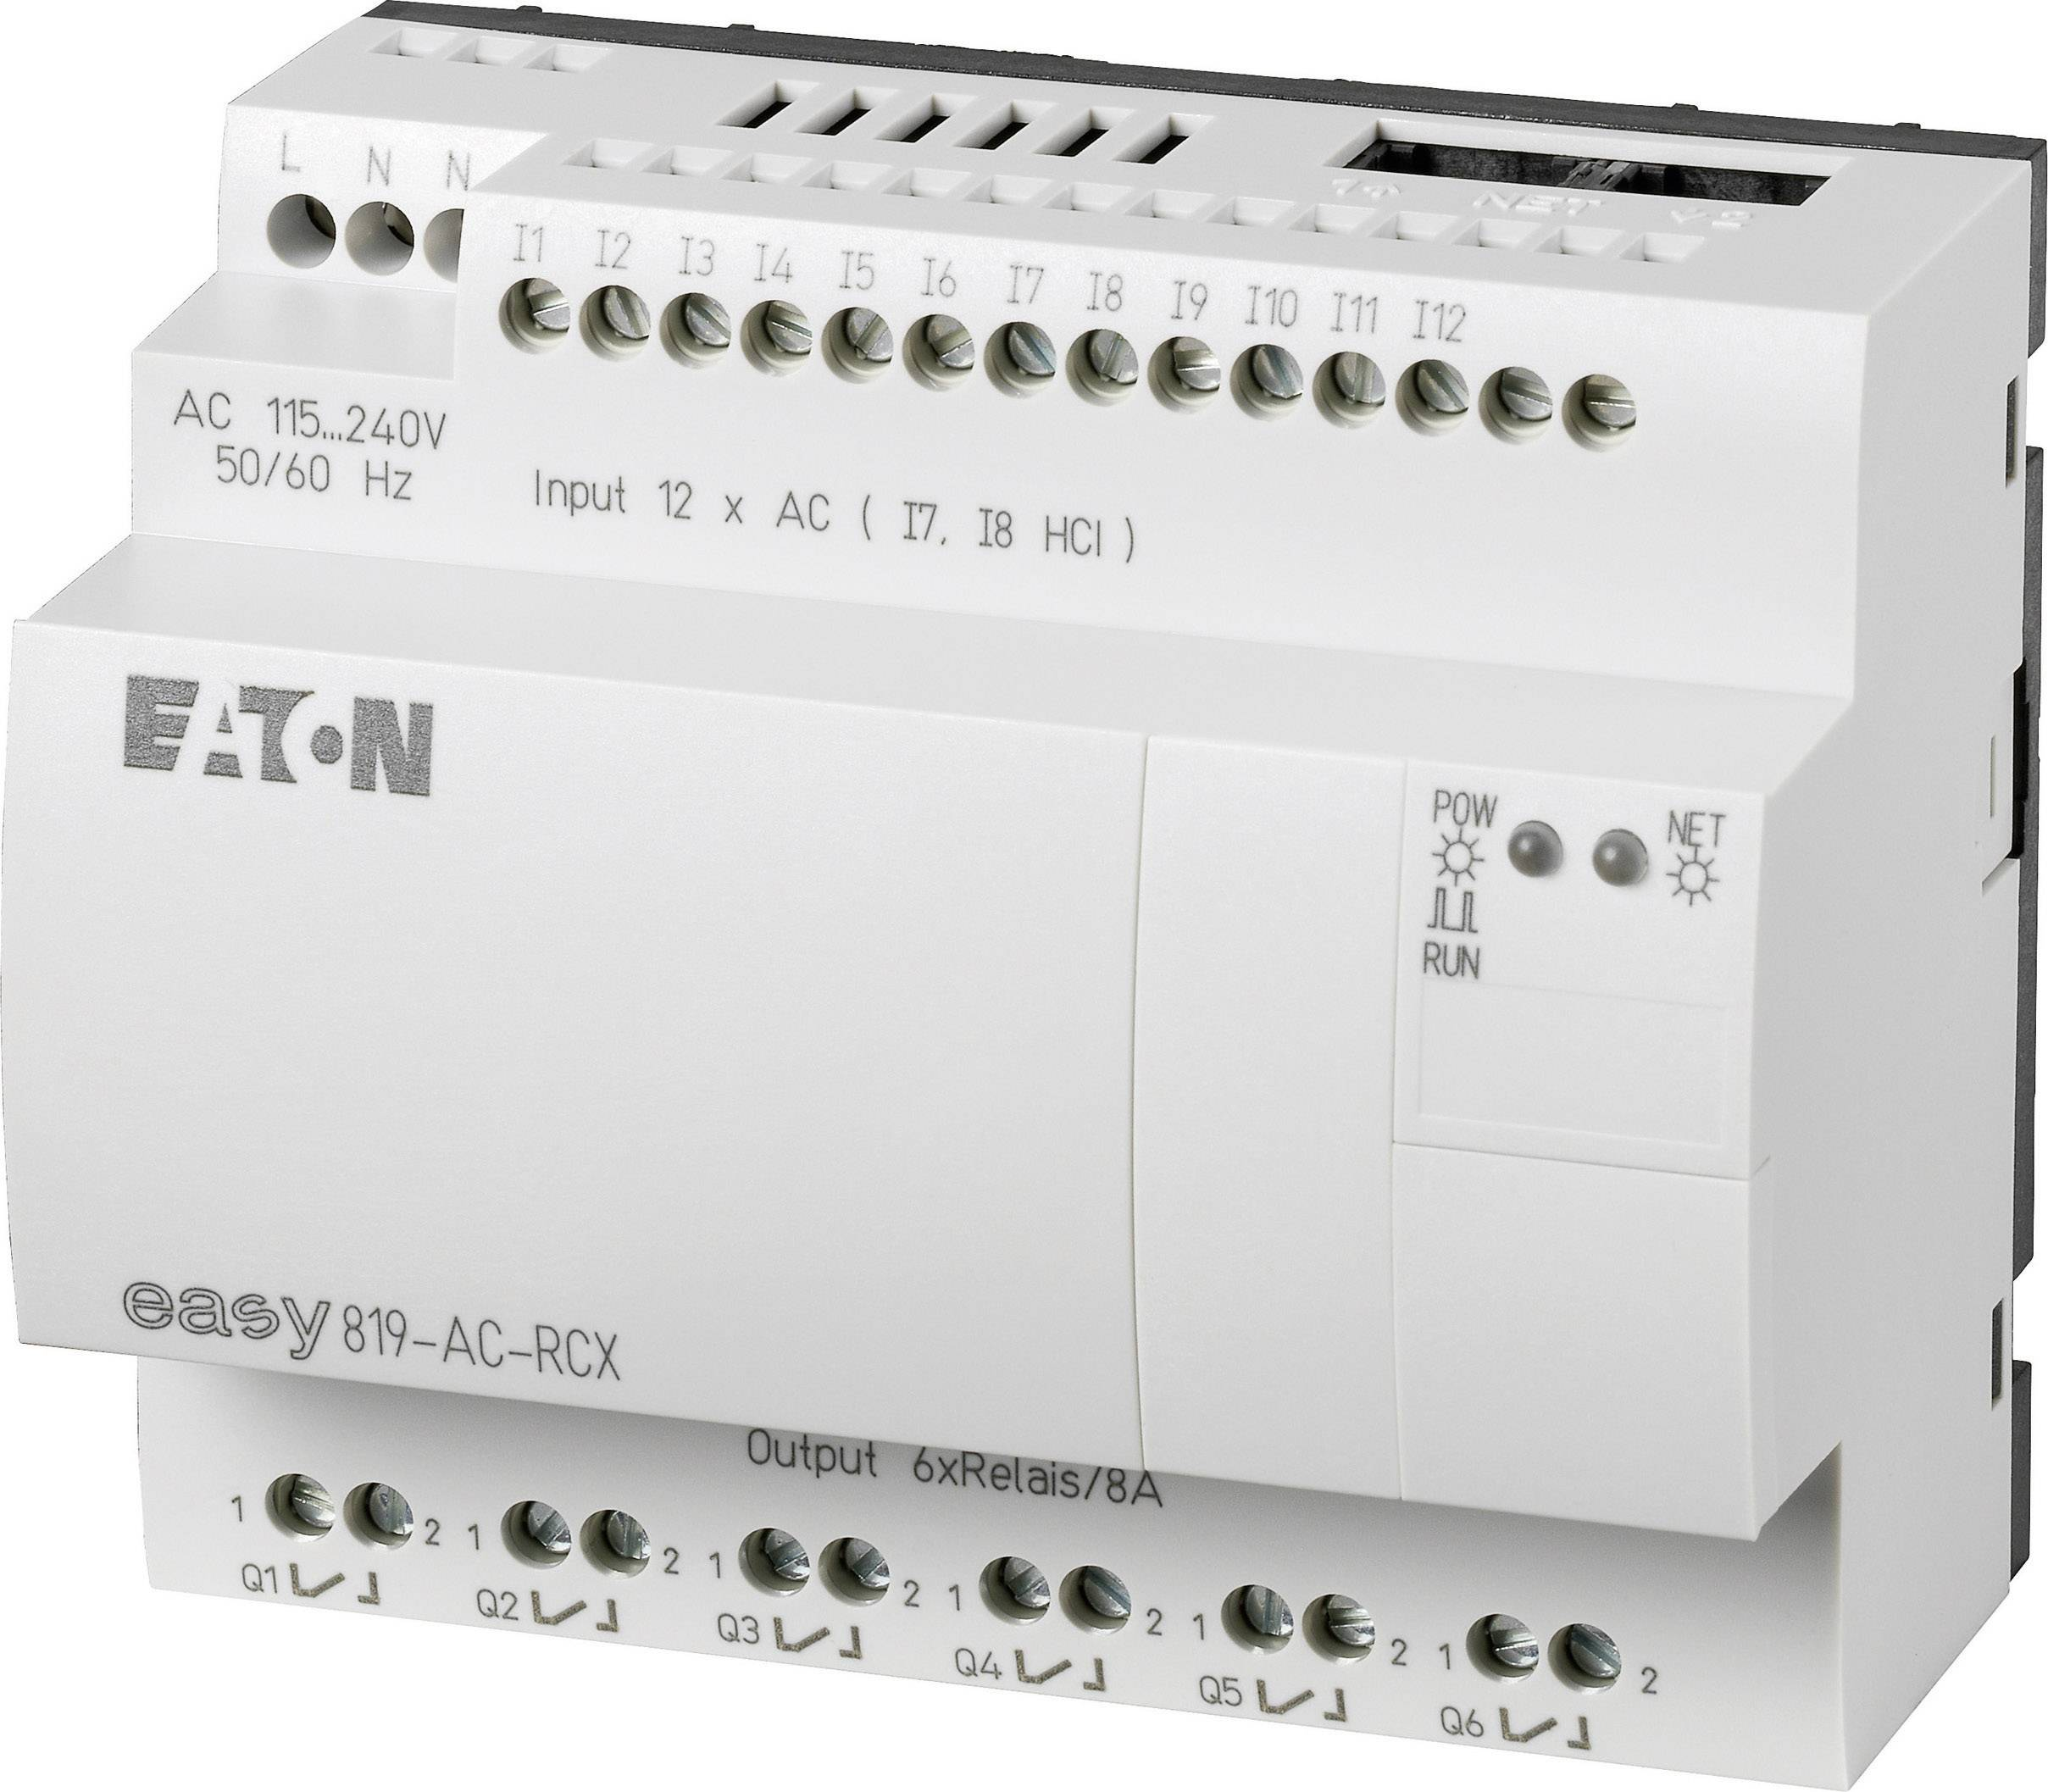 EASY 819-AC-RCX RS232/422/485